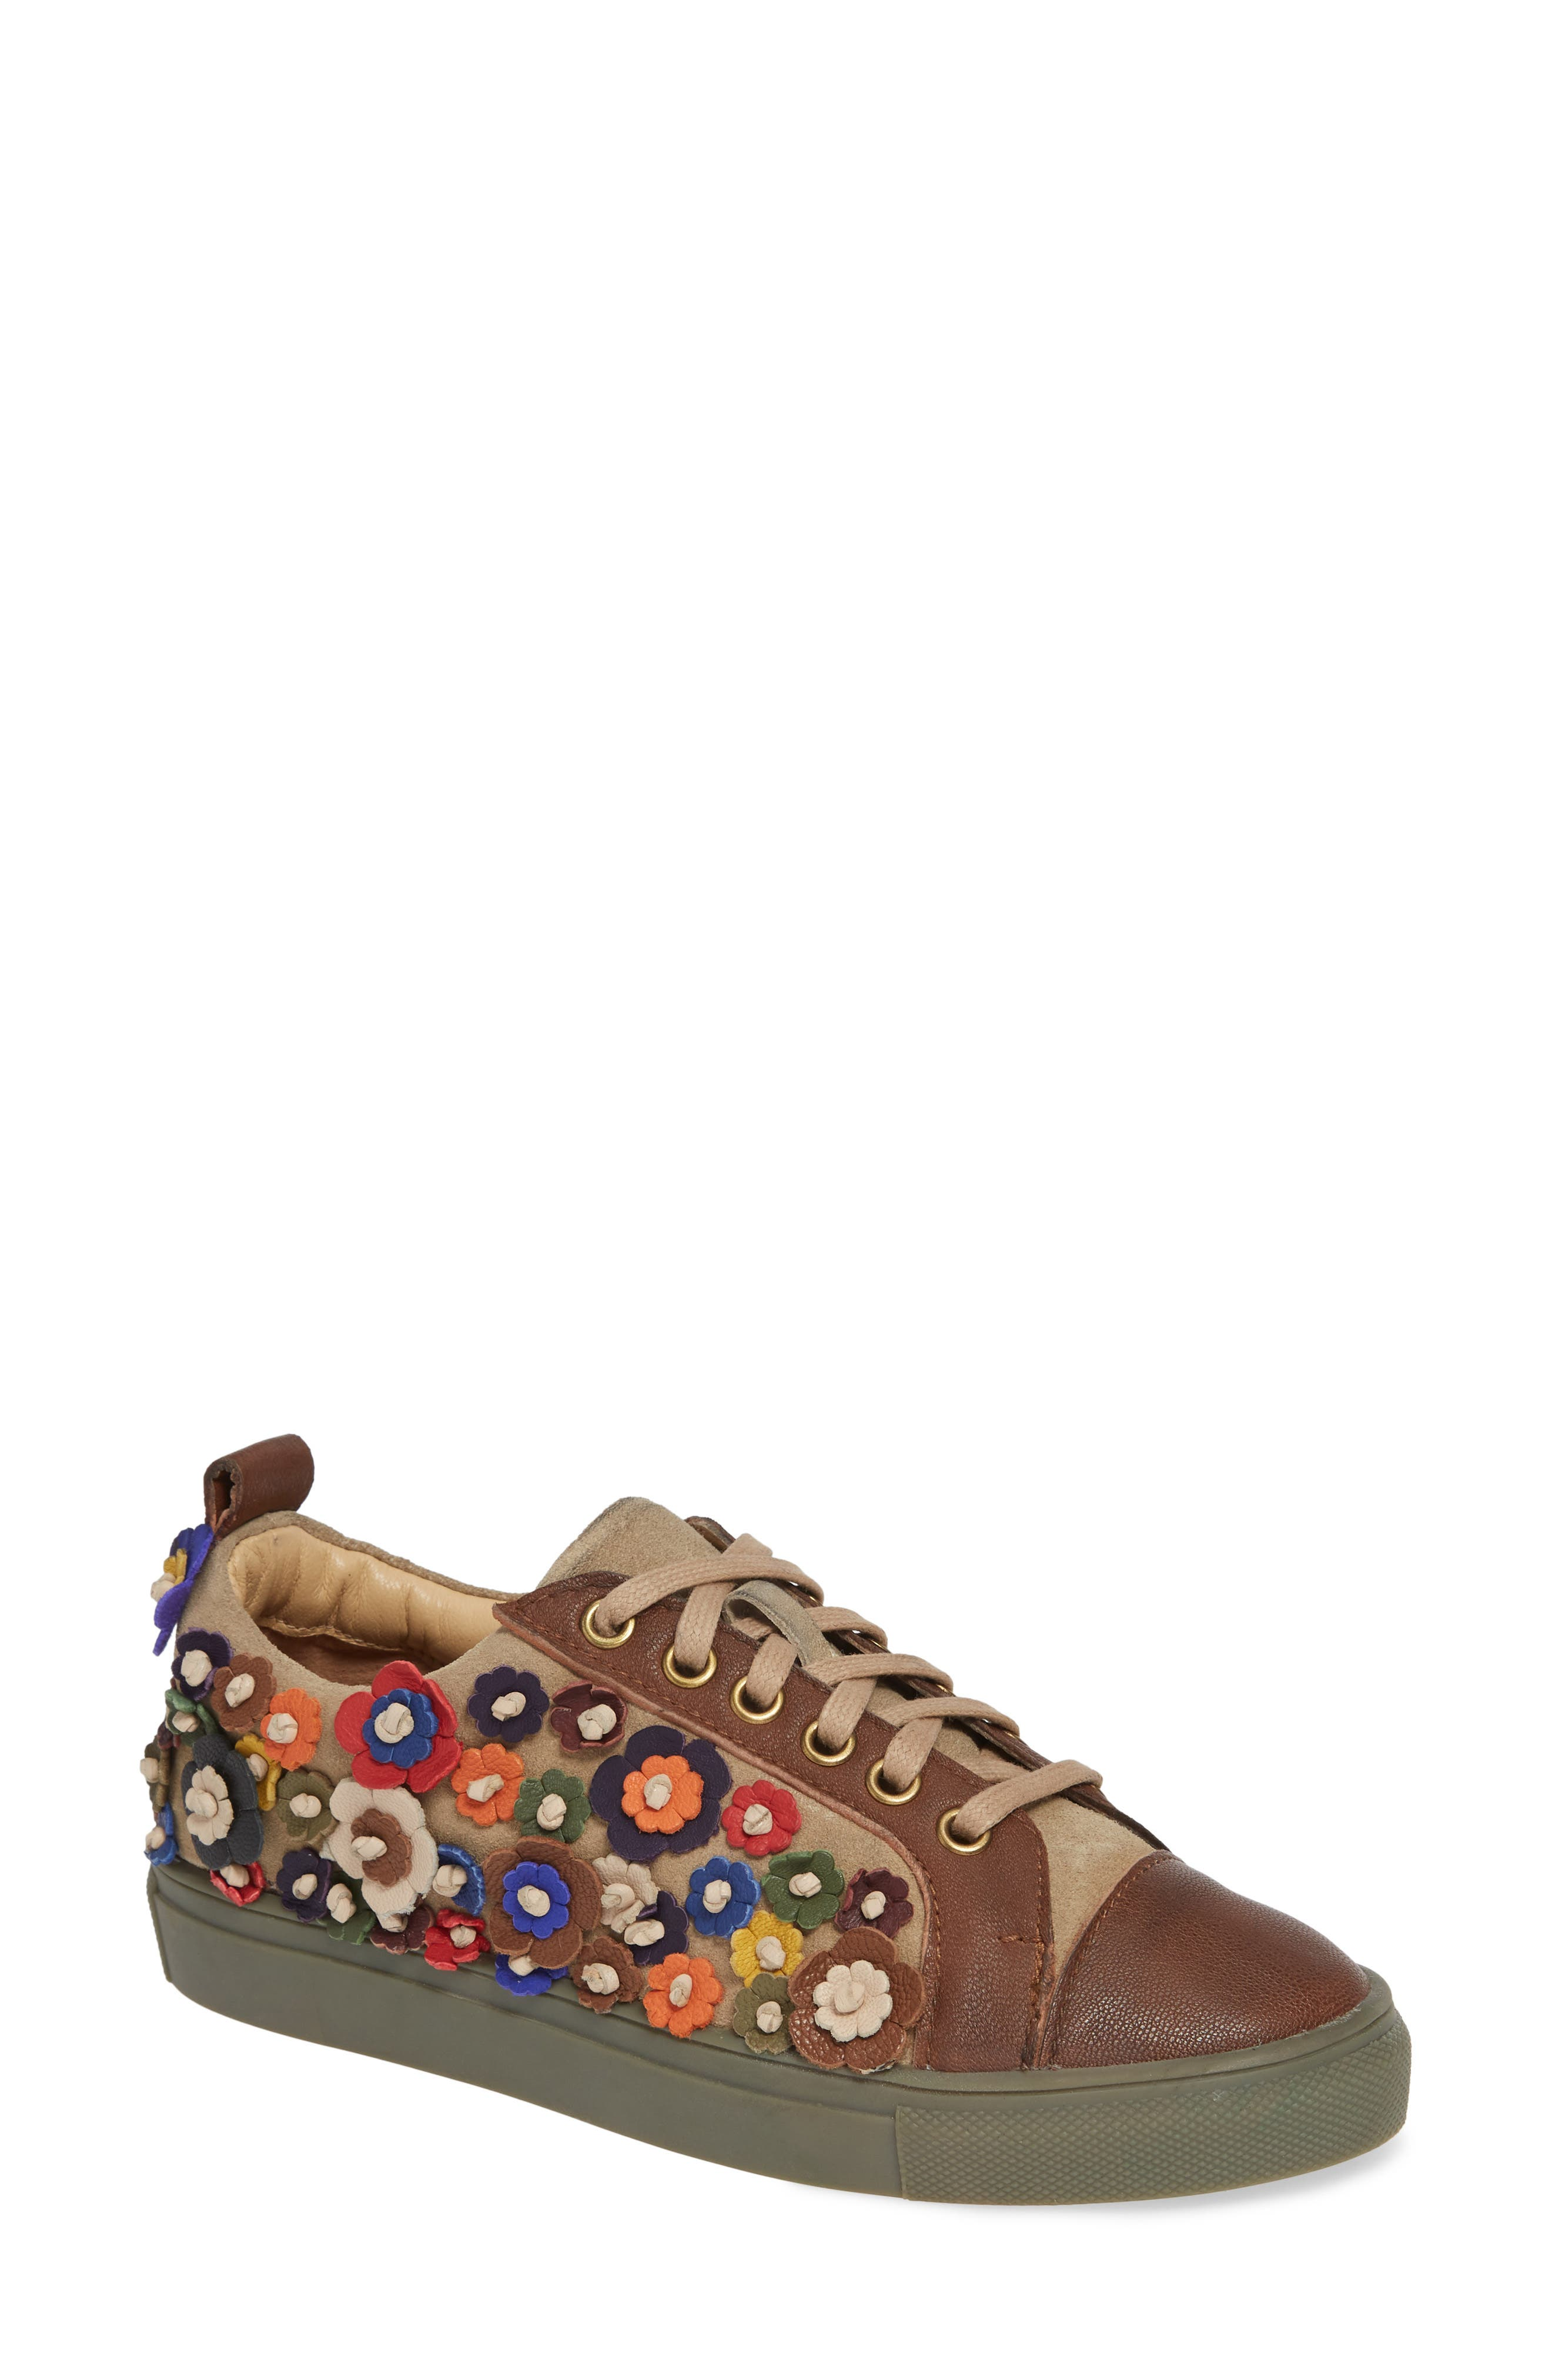 Sheridan Mia Satyr Sneaker, Brown